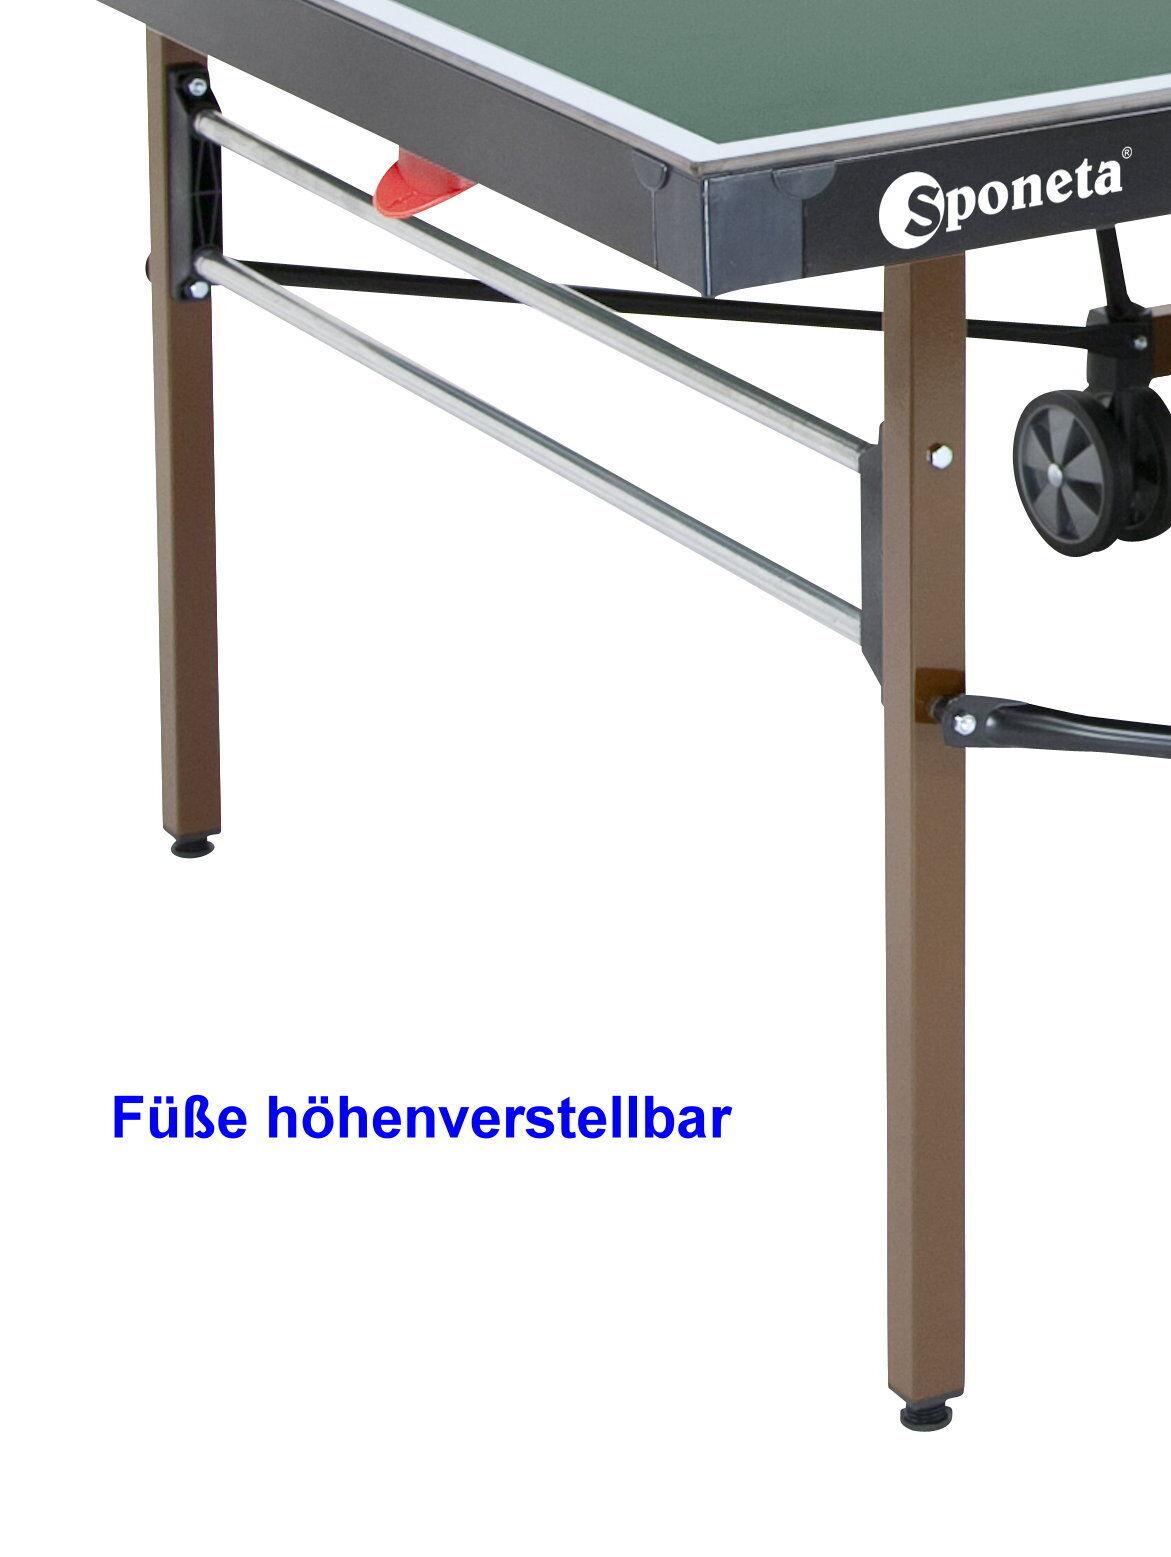 Sponeta S 4-72 e Tischtennisplatte outdoor wetterfest mit Netz Tischtennistisch Tischtennistisch Tischtennistisch e96512